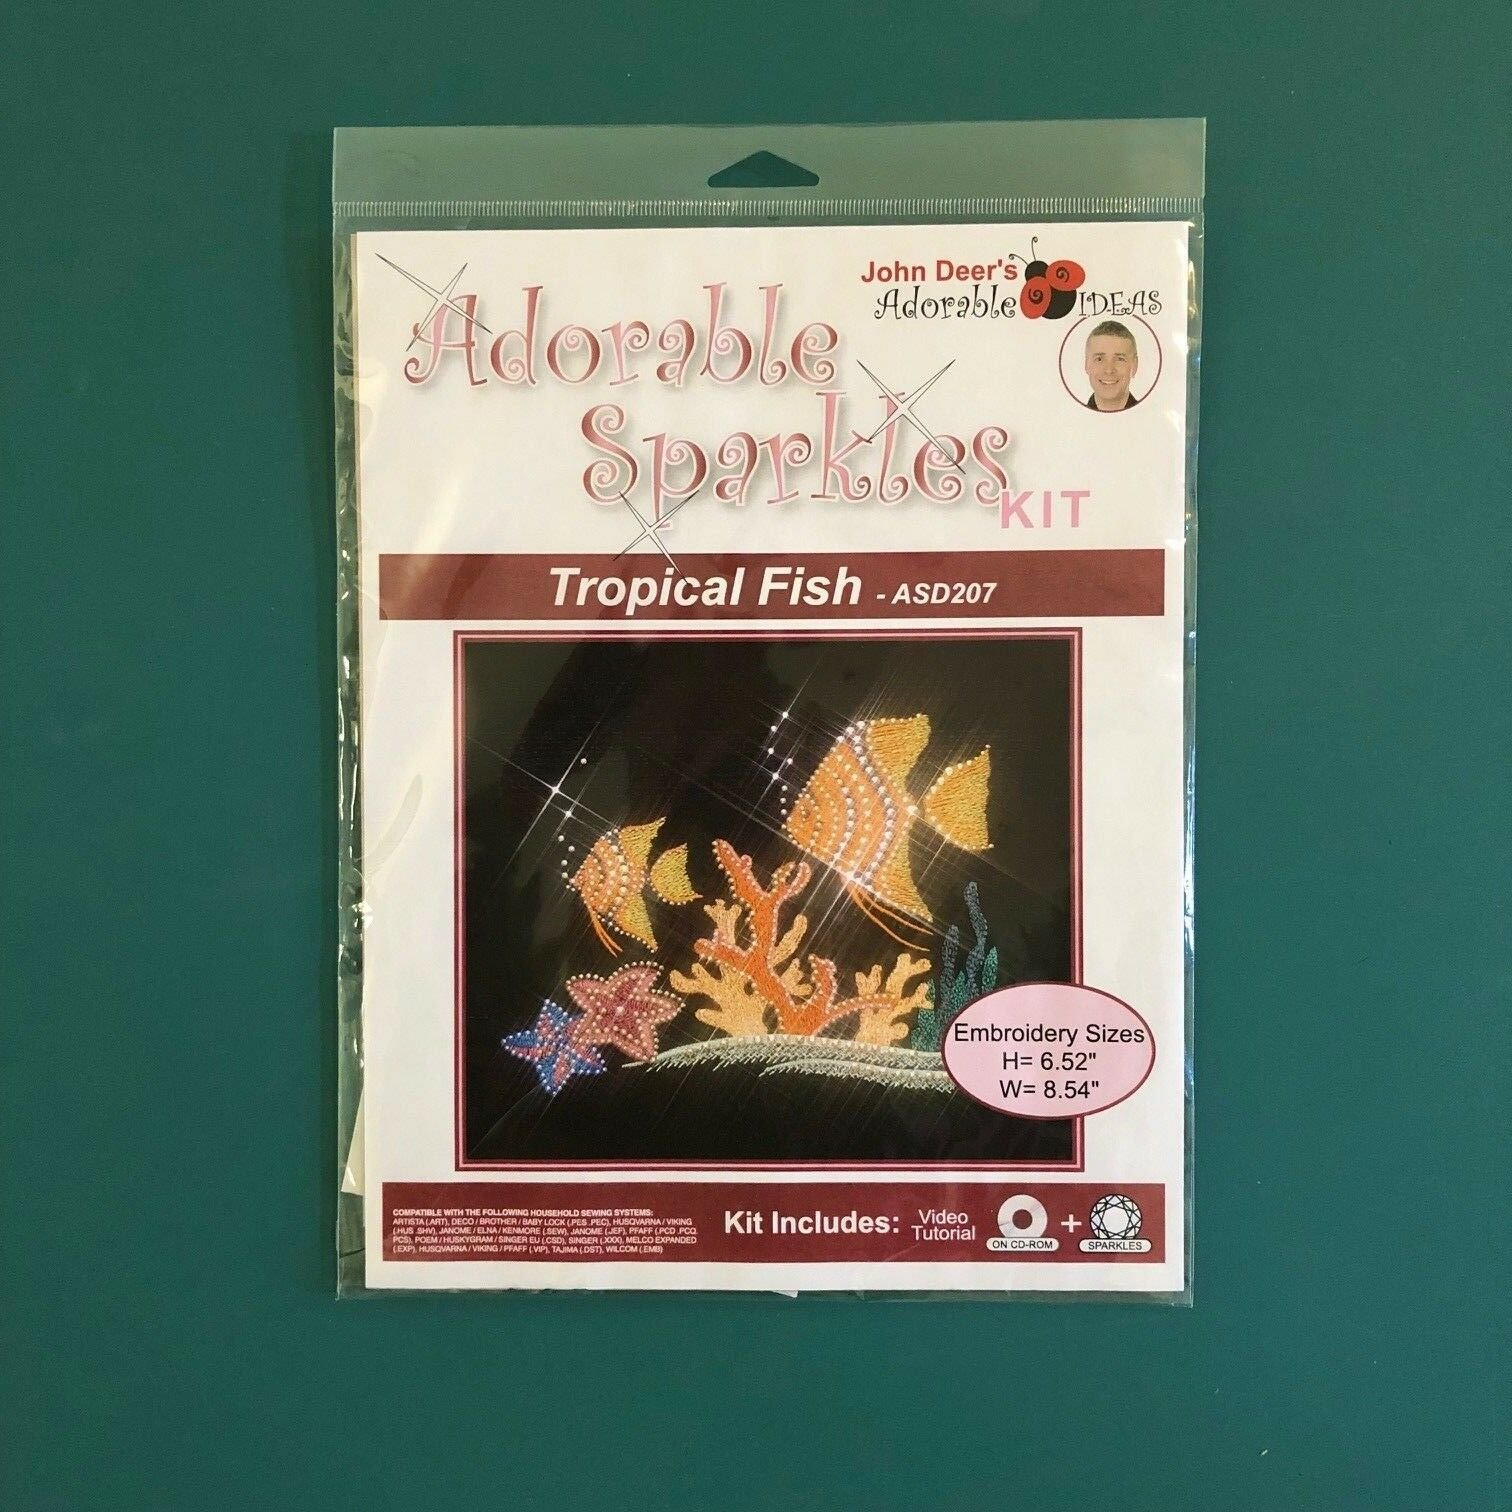 Adorable Sparkles Kit - Tropical Fish